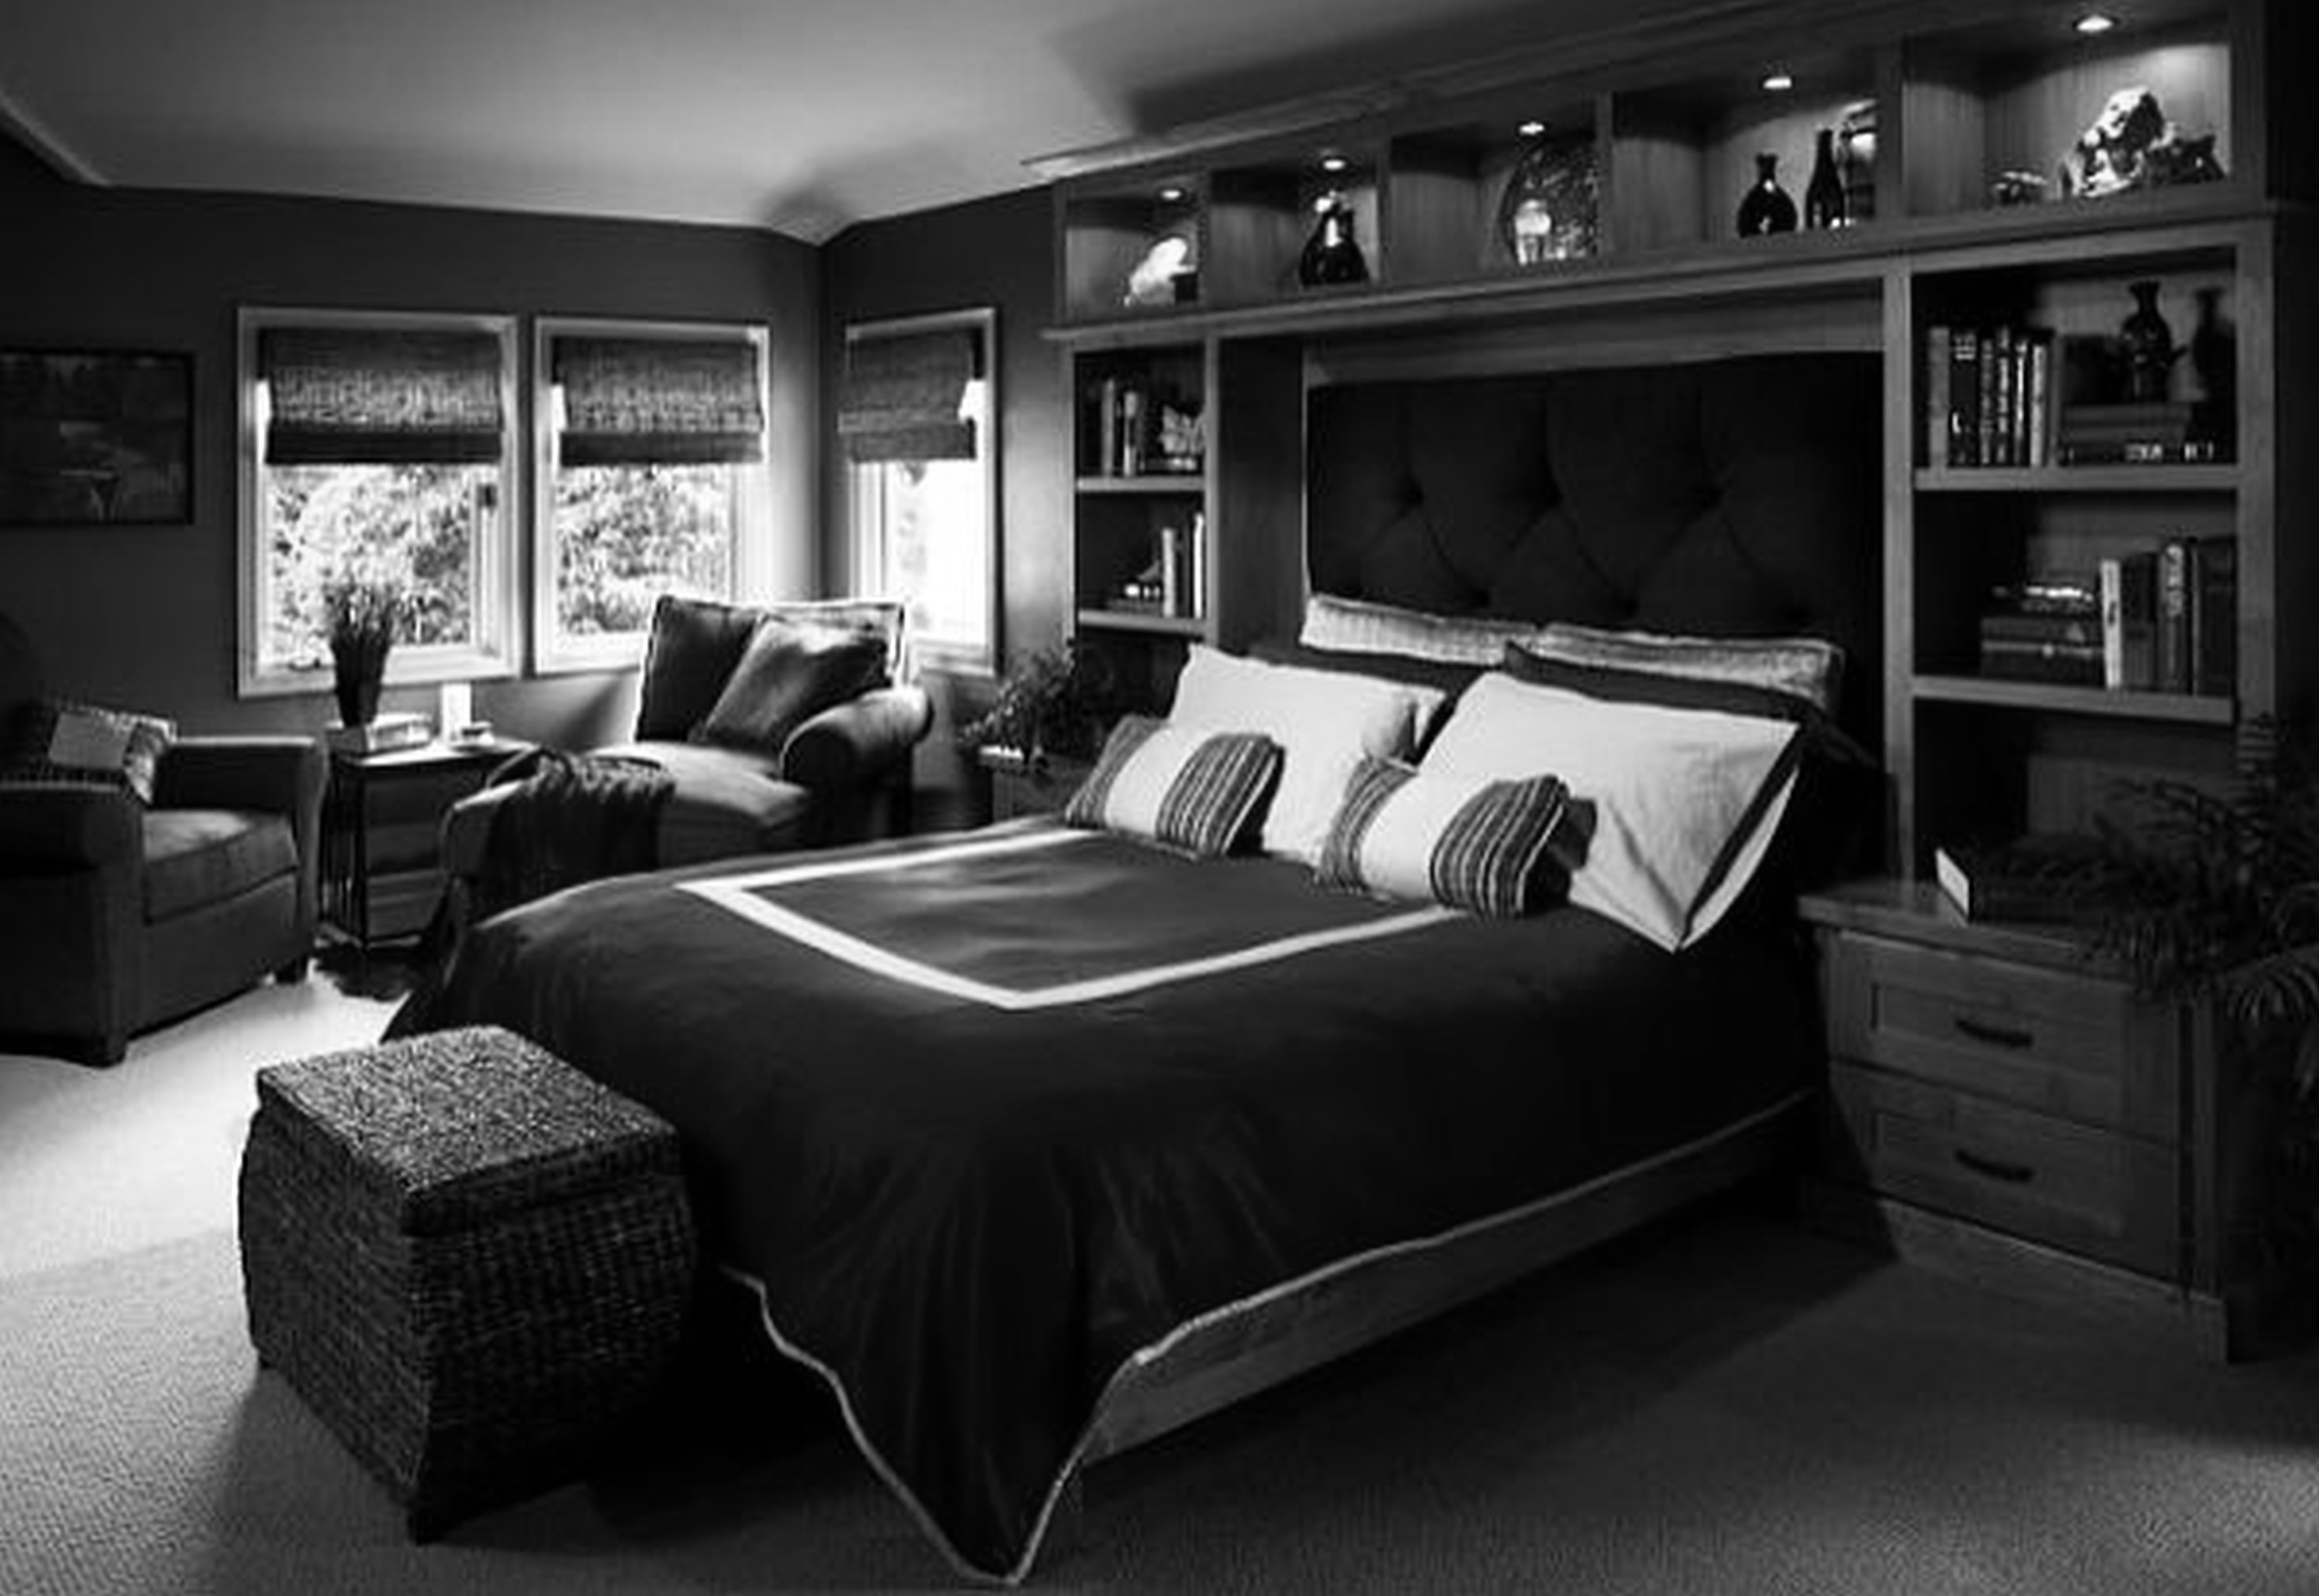 Men Bedroom Decor Bedroom Men Ideas Pesquisa Google Quarto Ideia Pinterest